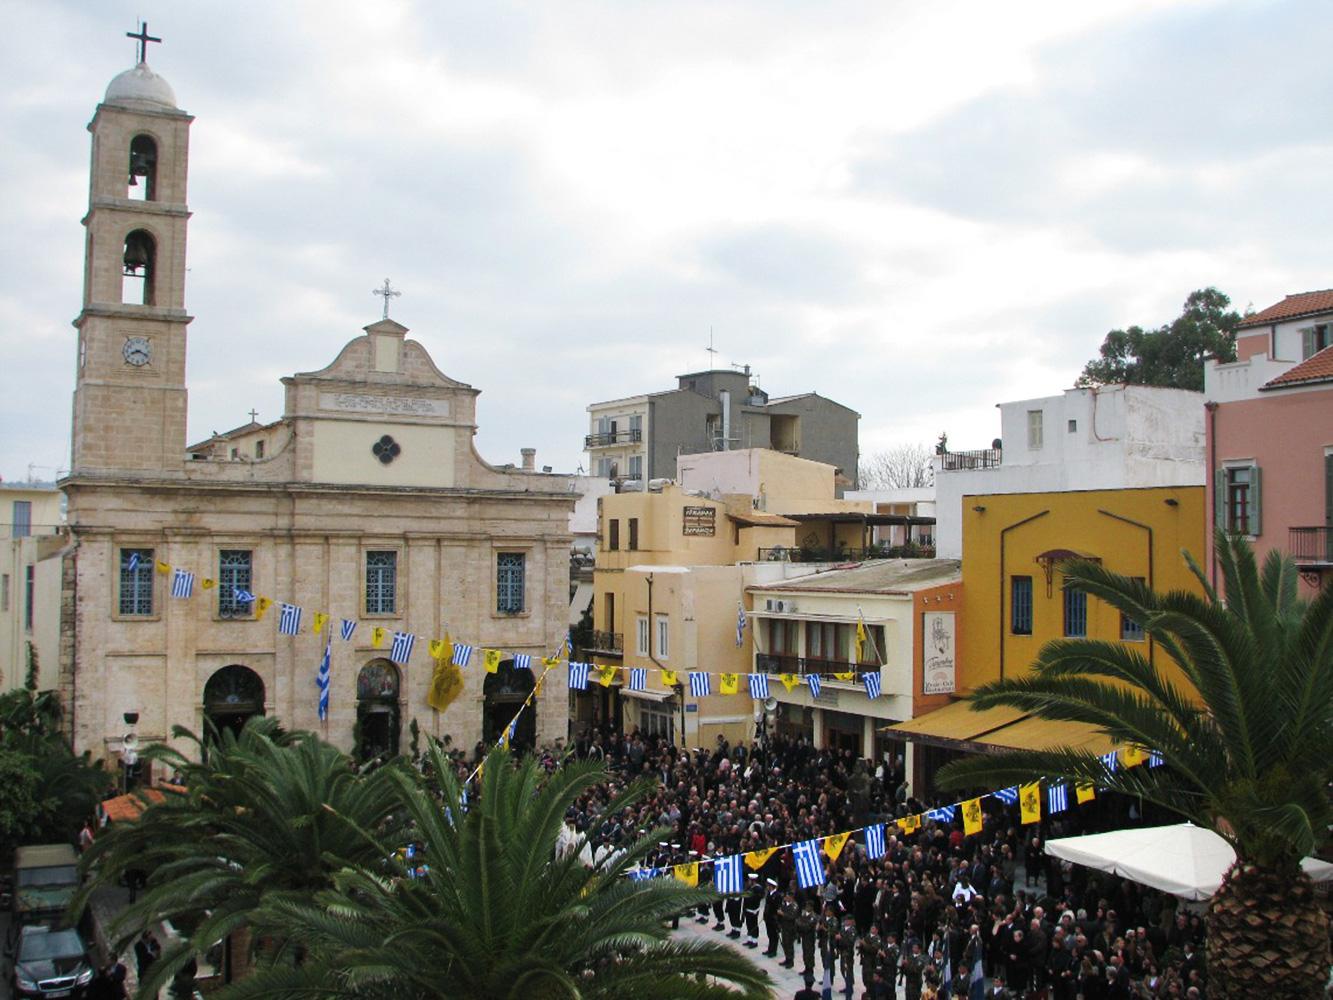 Military Parade at the Mitropoli Square